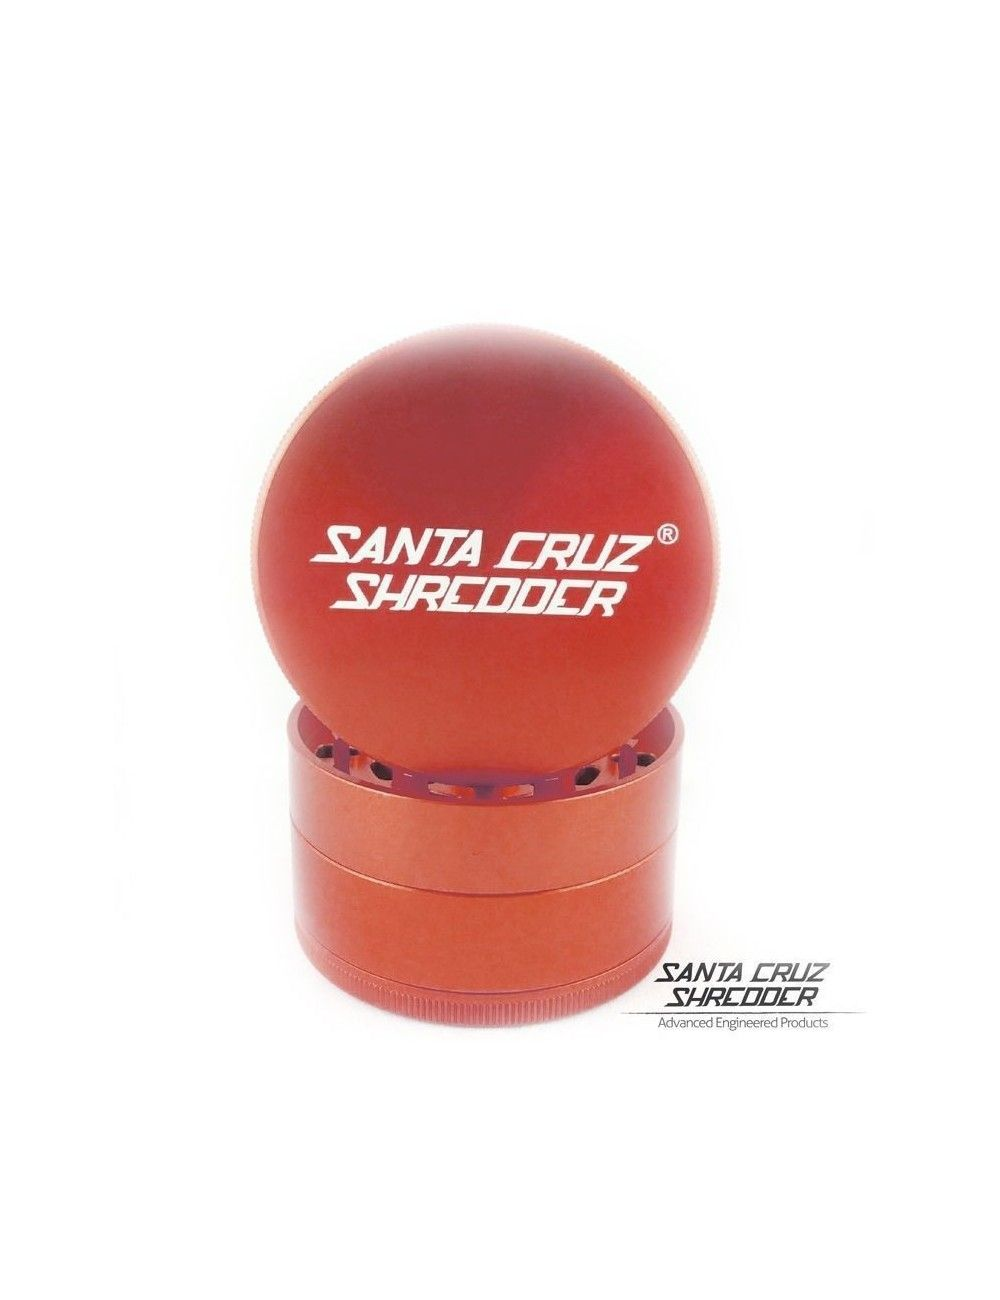 Santa Cruz Shredder 4-piece Large - Red